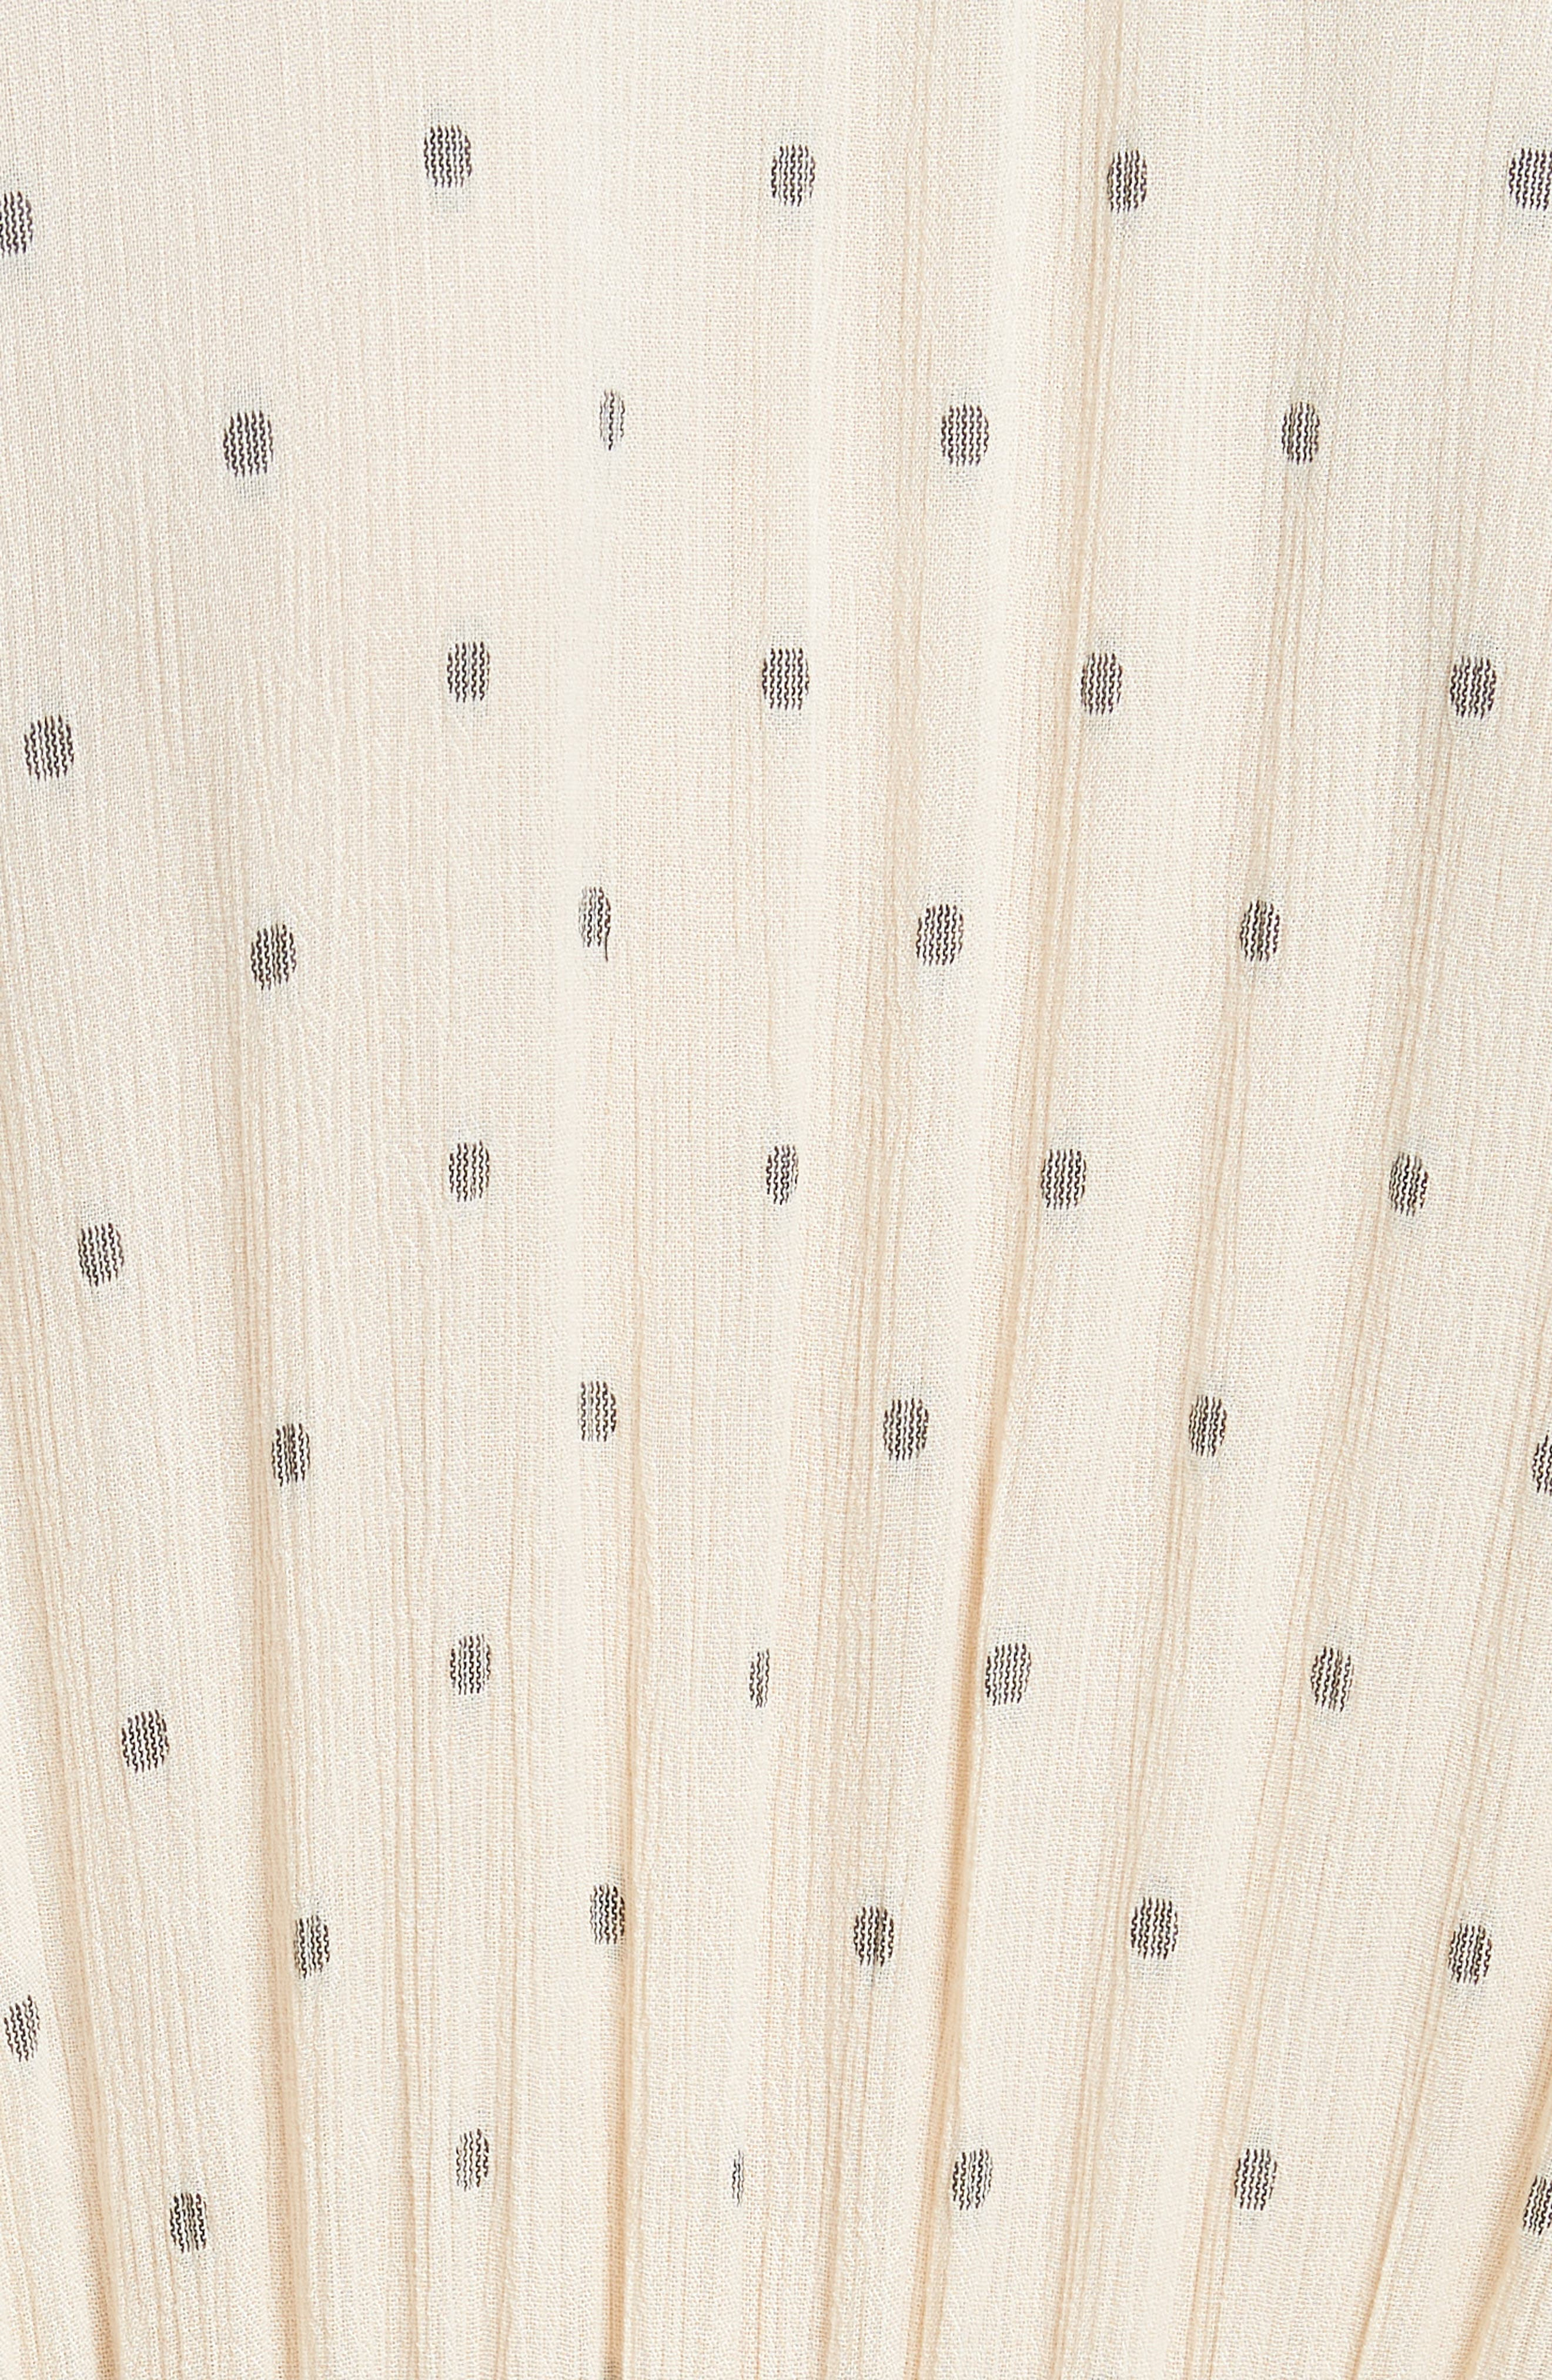 Sada Maxi Dress,                             Alternate thumbnail 6, color,                             903